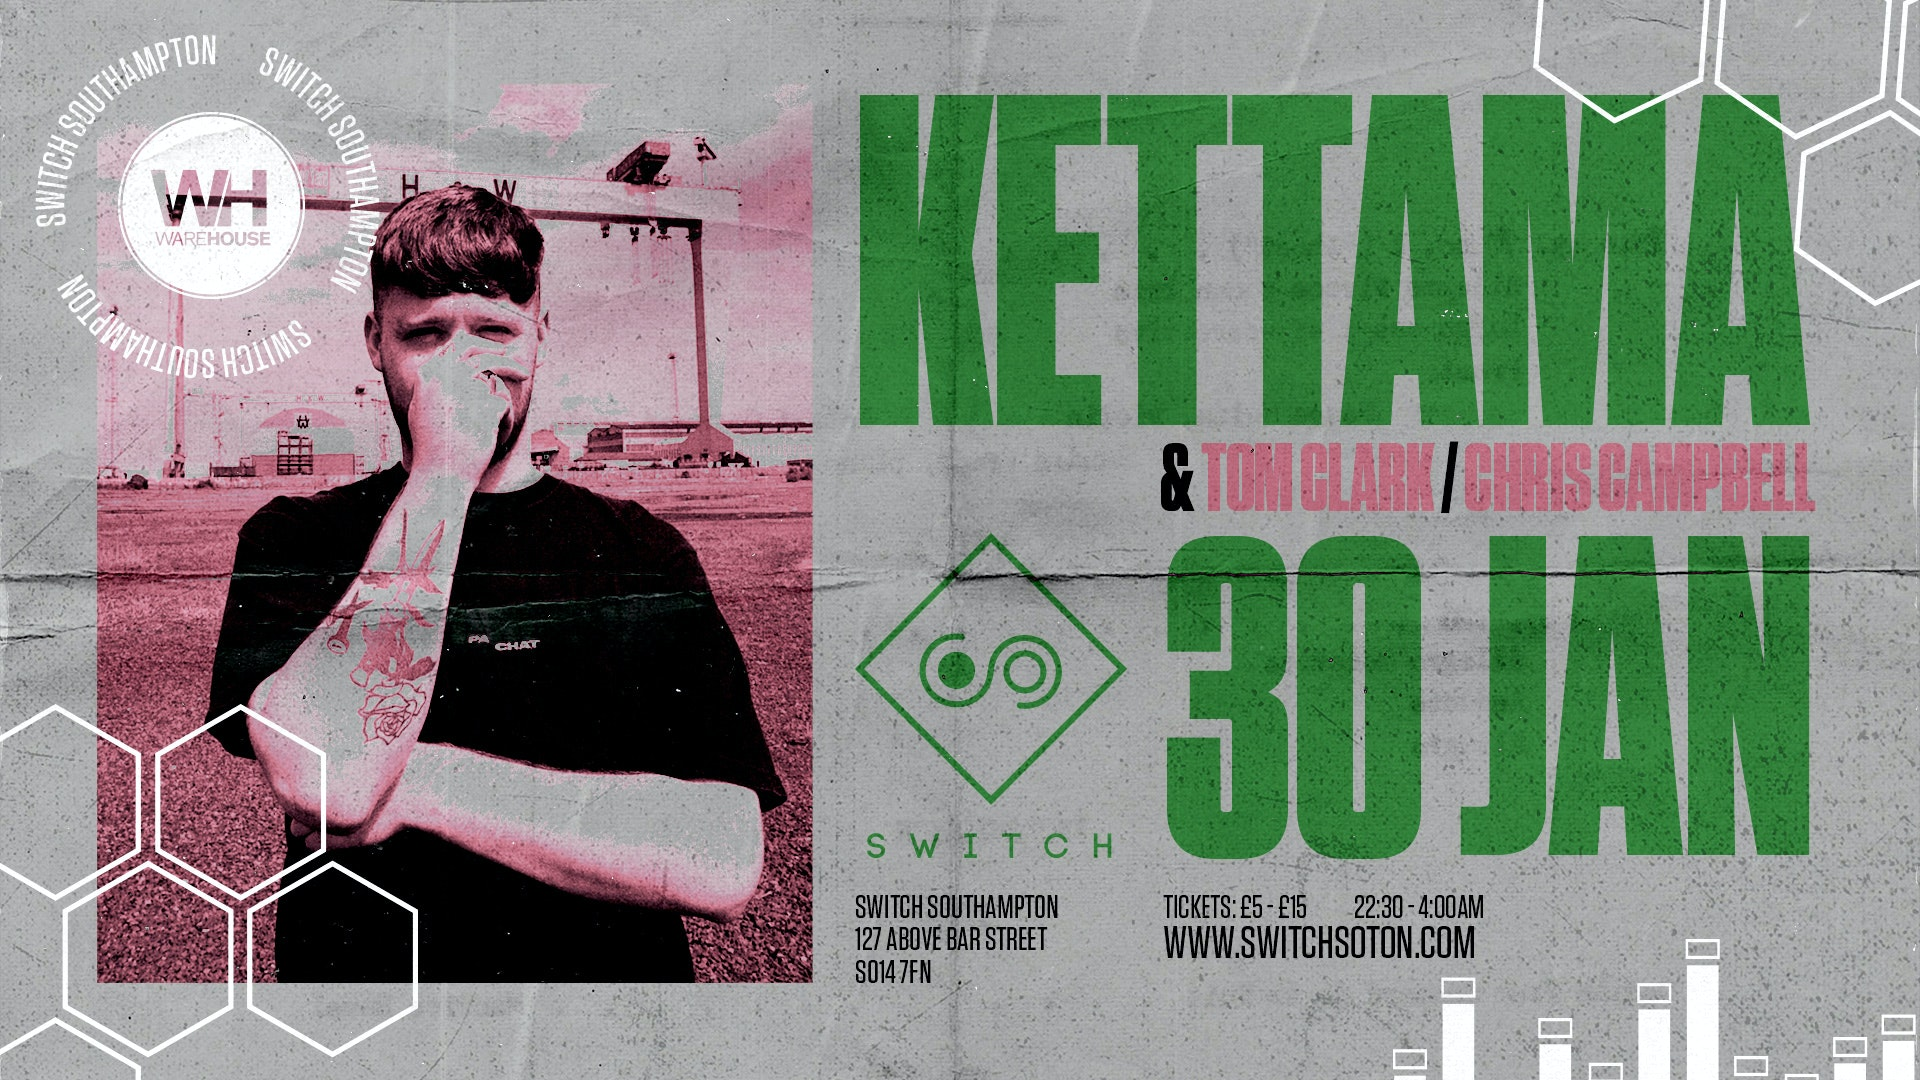 Warehouse Presents: Kettama